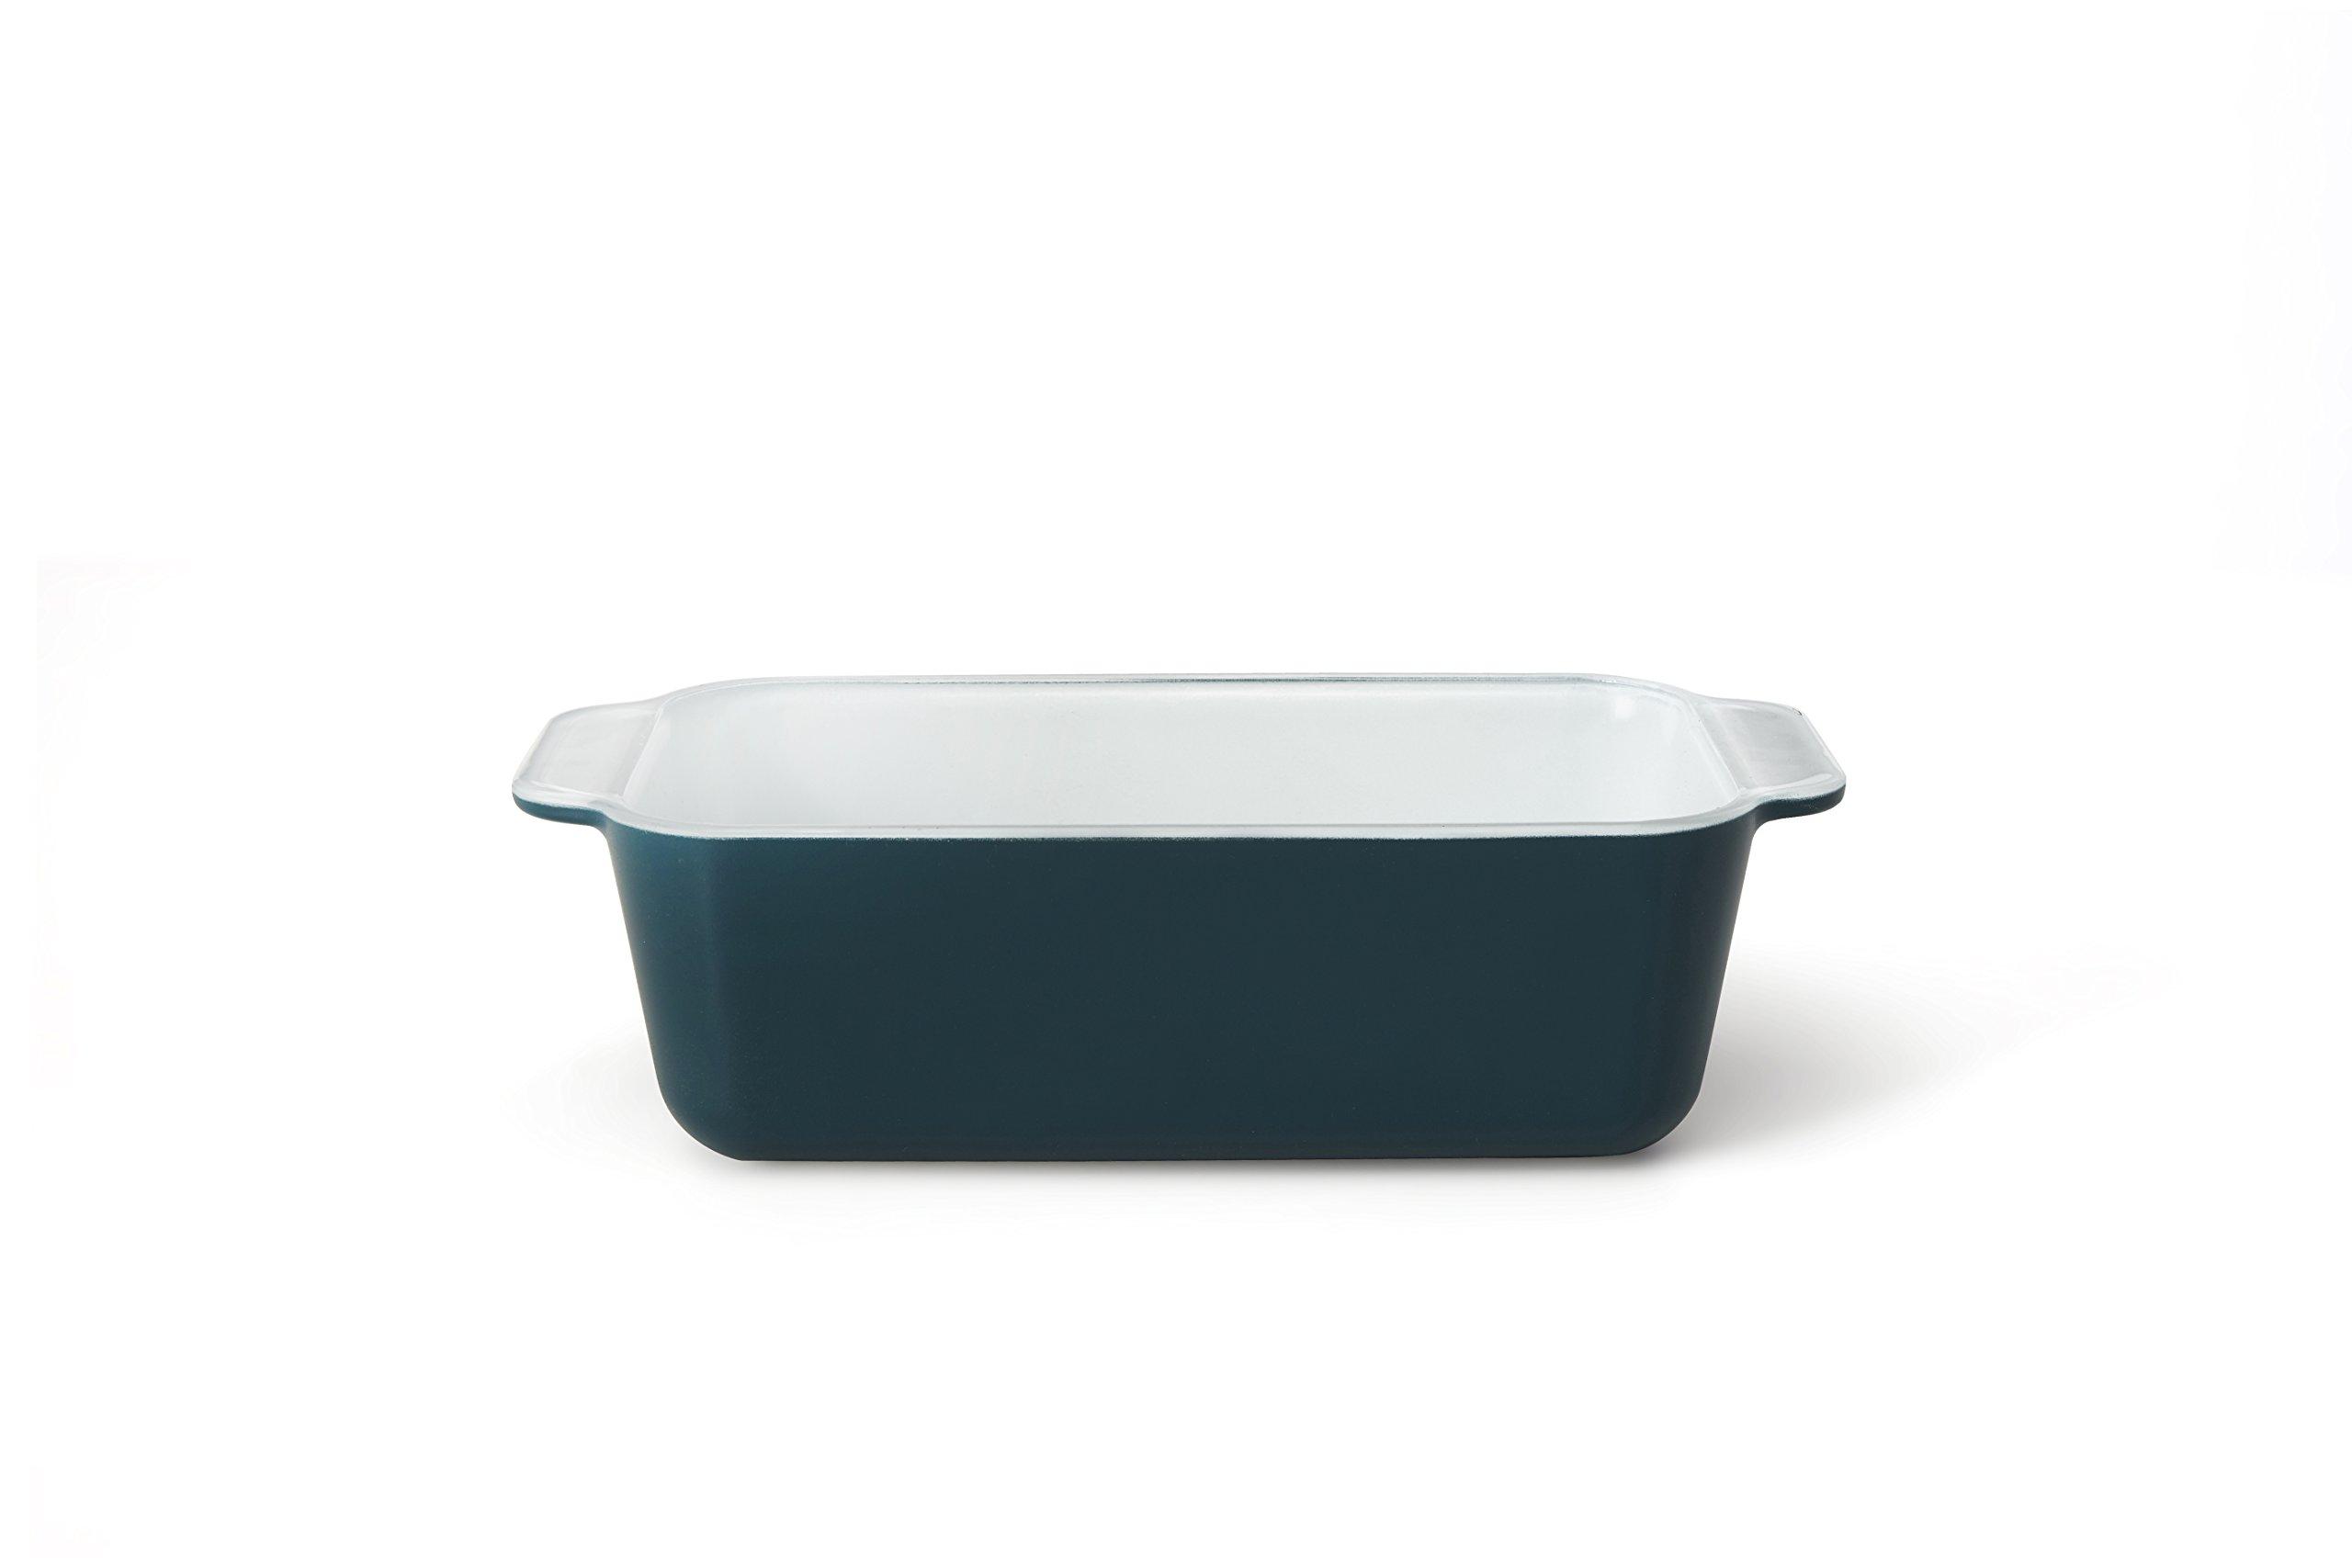 Creo SmartGlass Cookware, 8.5 inch Loaf Pan, Mediterranean Blue